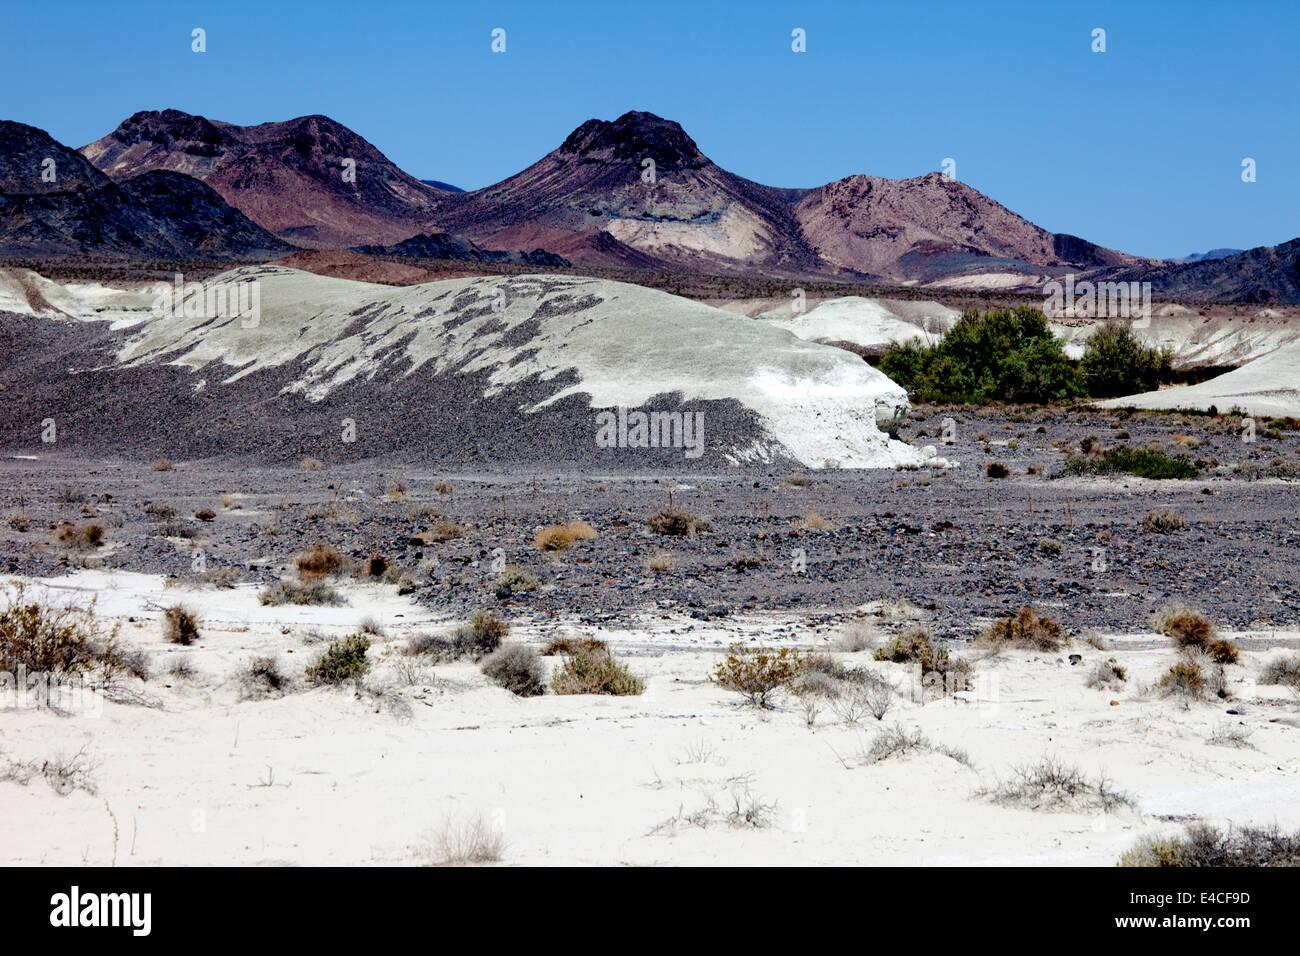 Landscape near Shoshone near Death Valley, Calif, USA - Stock Image